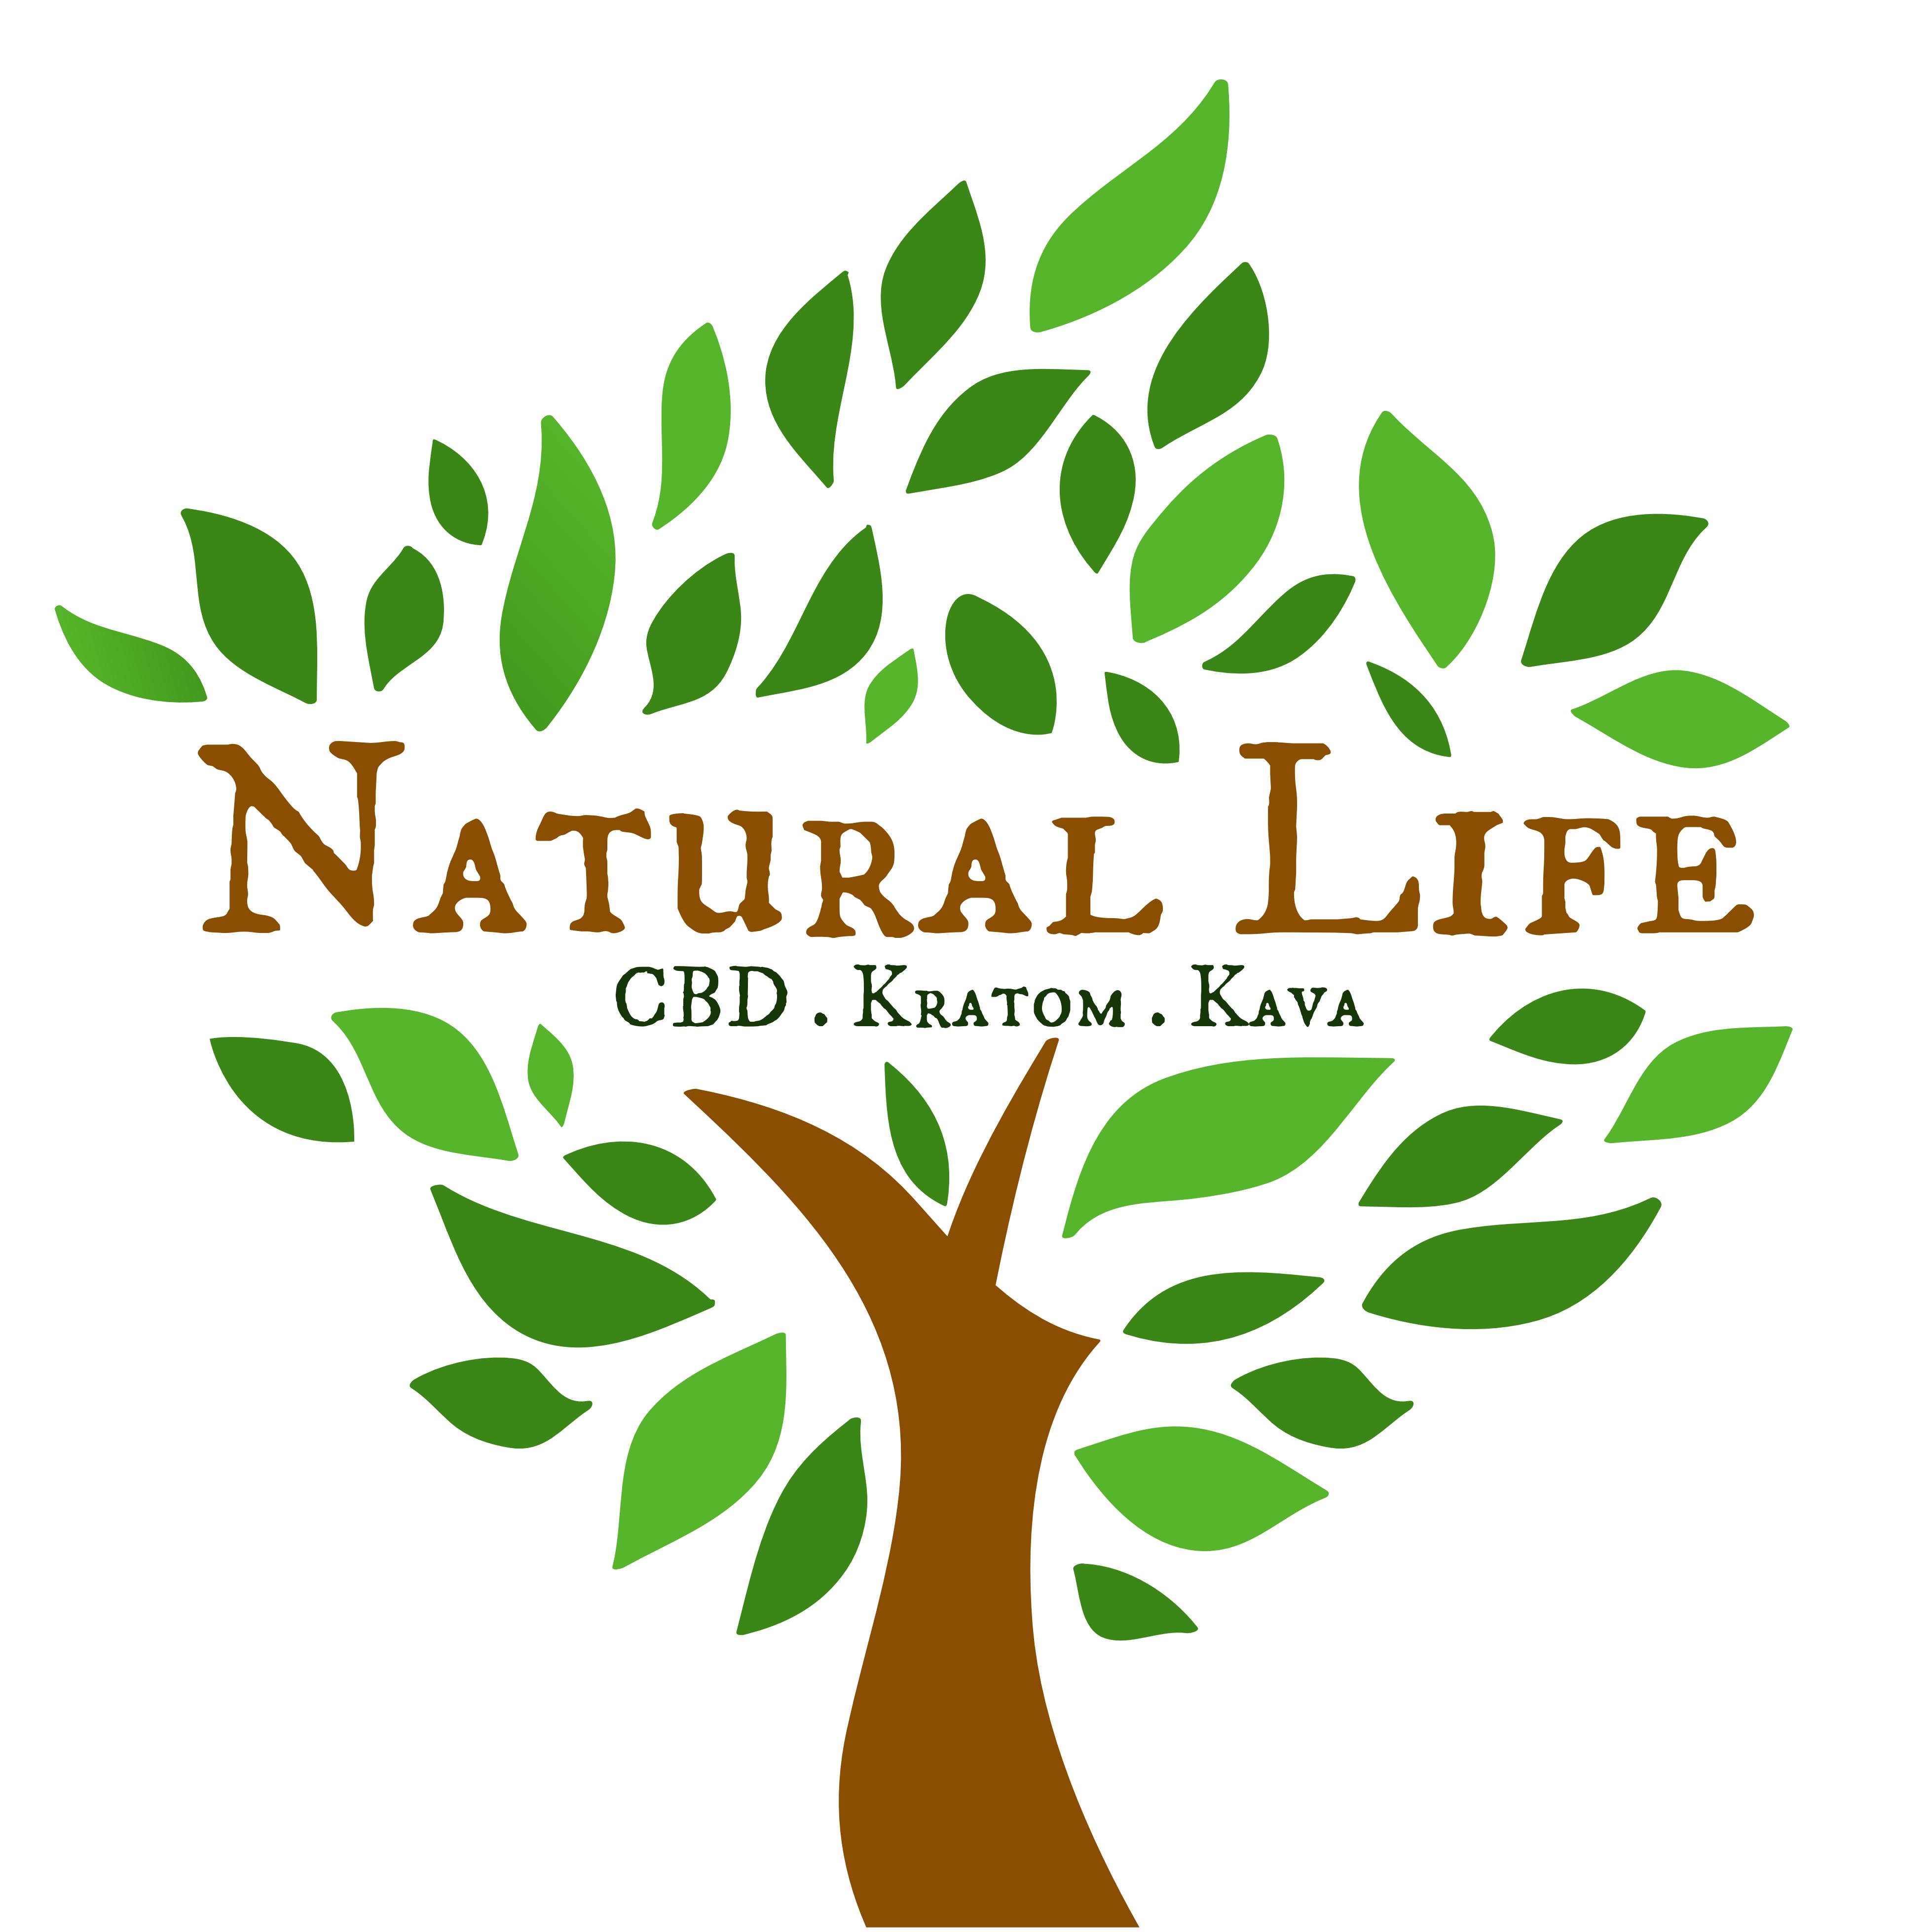 Natural Life - Jacksonville, FL 32224 - (904)367-2138 | ShowMeLocal.com